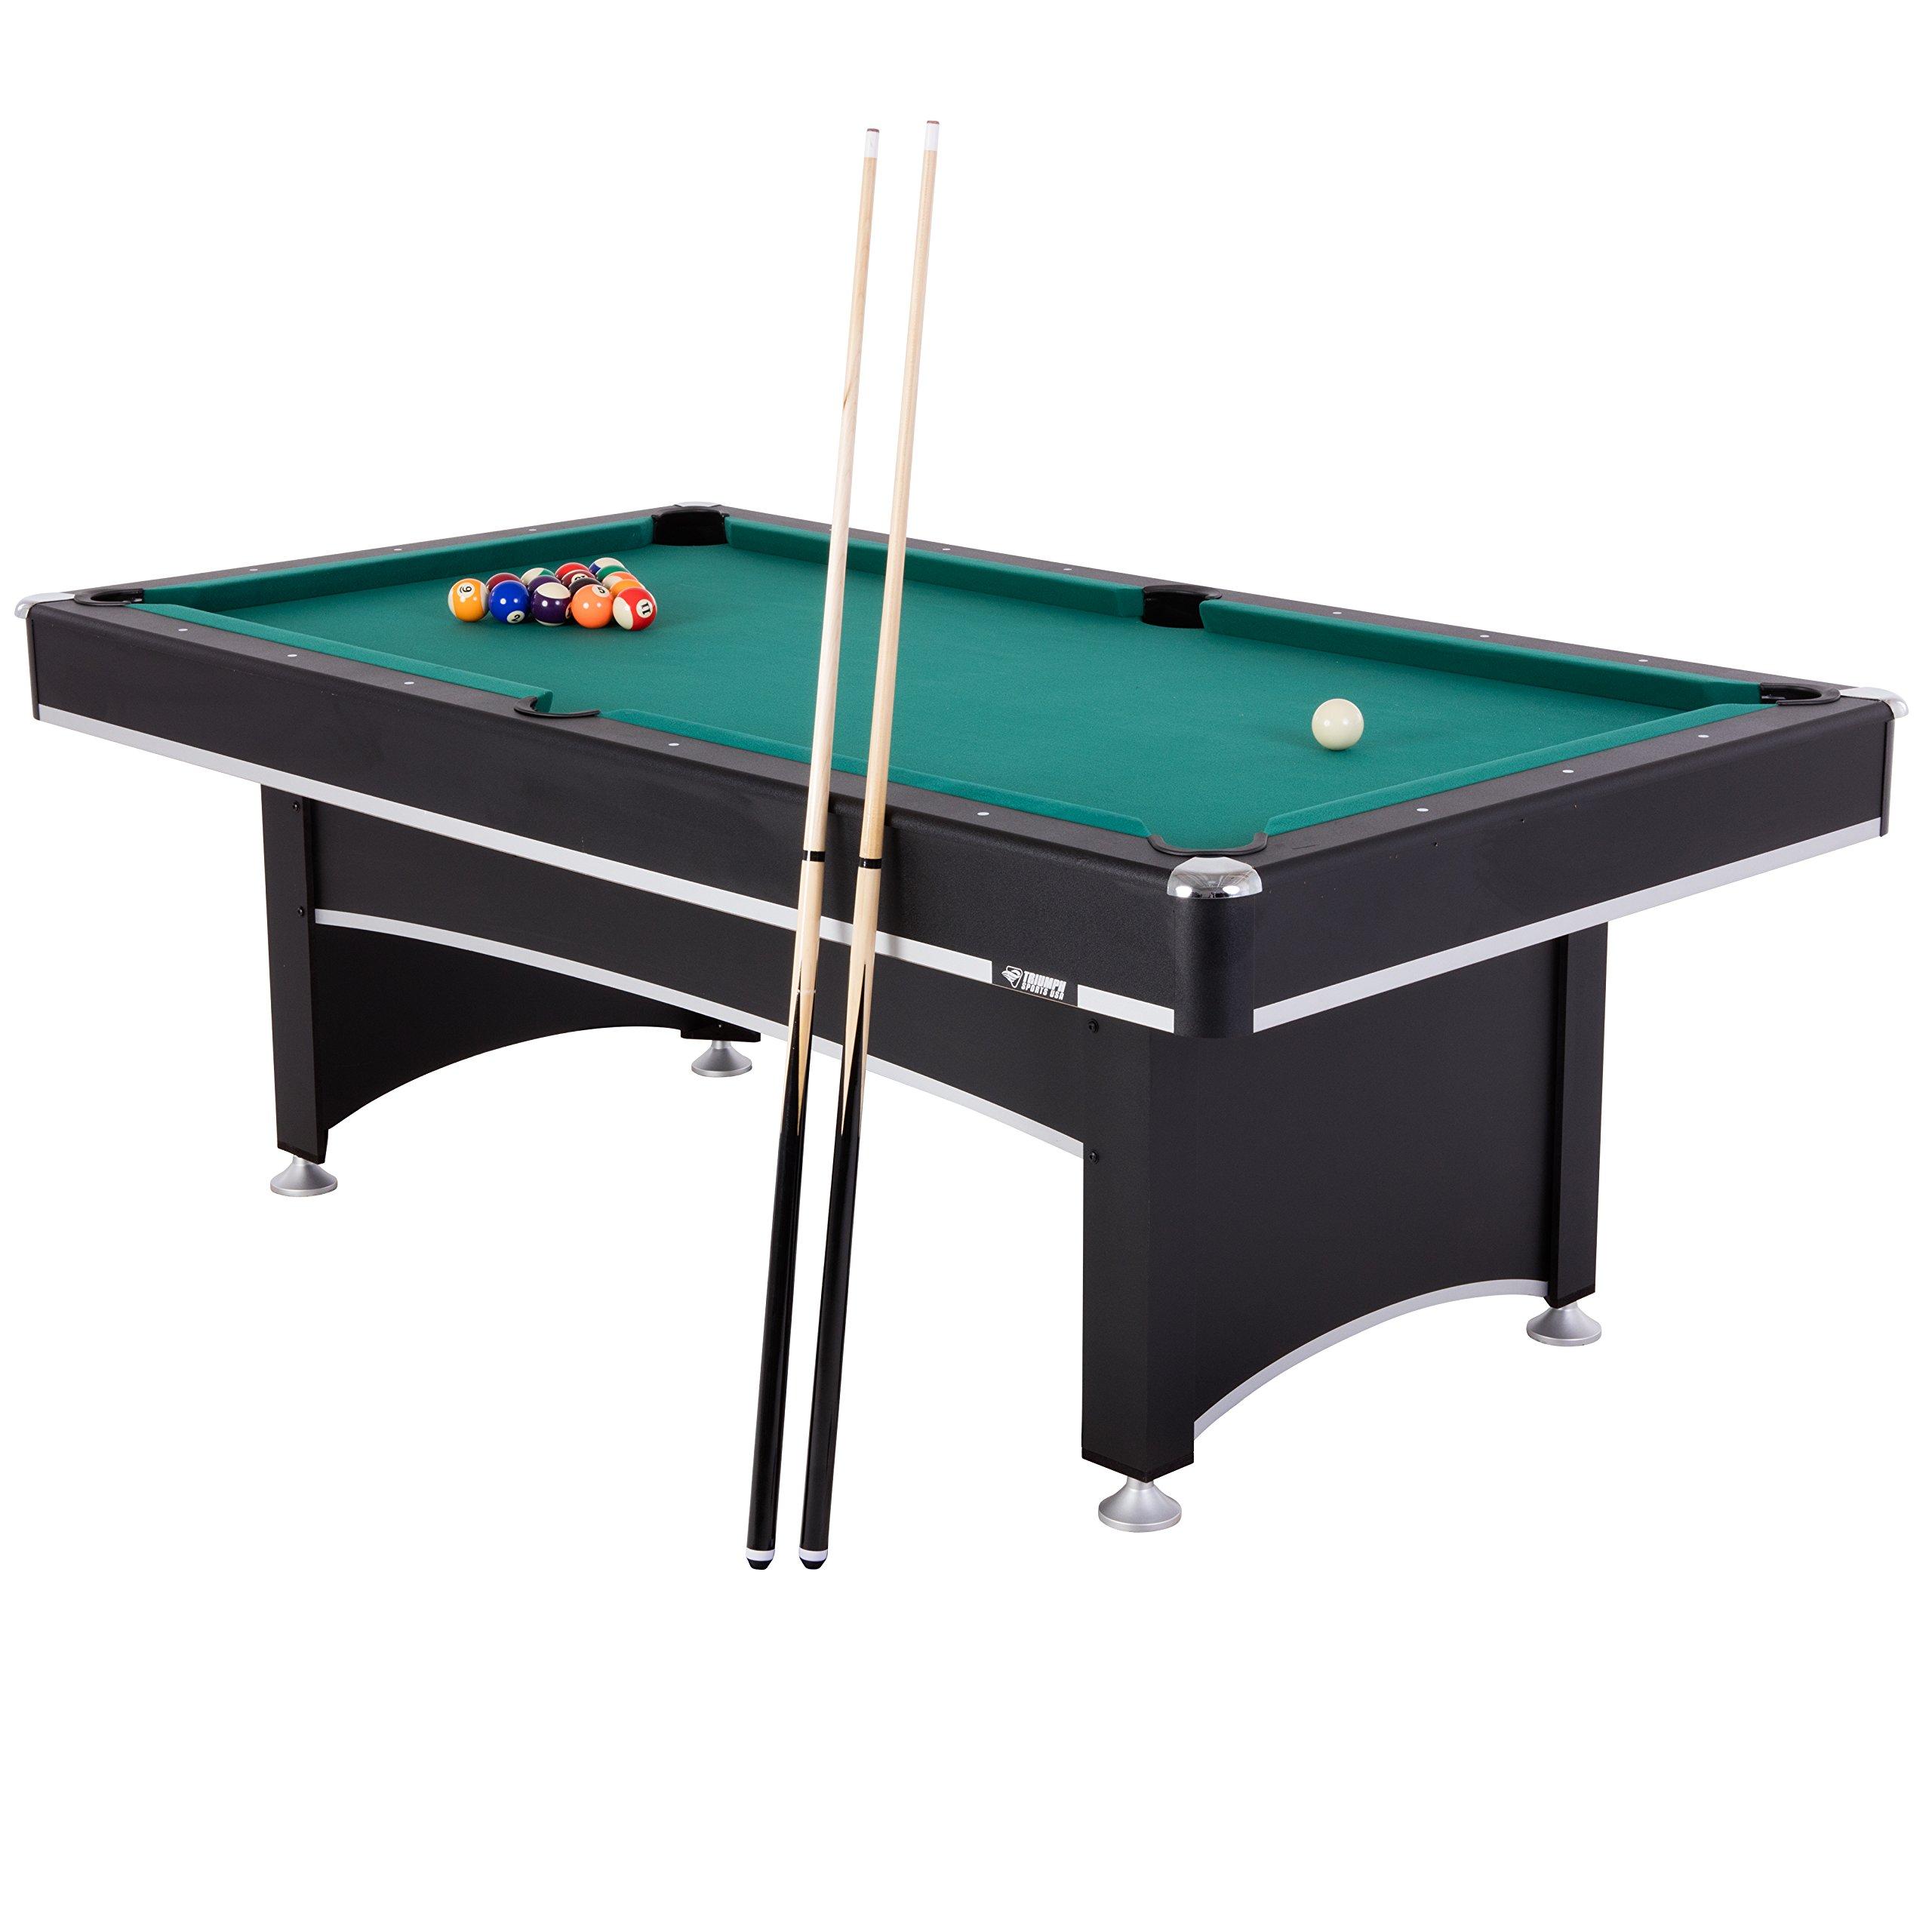 Triumph Sports Phoenix 7' Billiard Table with Table Tennis Conversion Top by Triumph